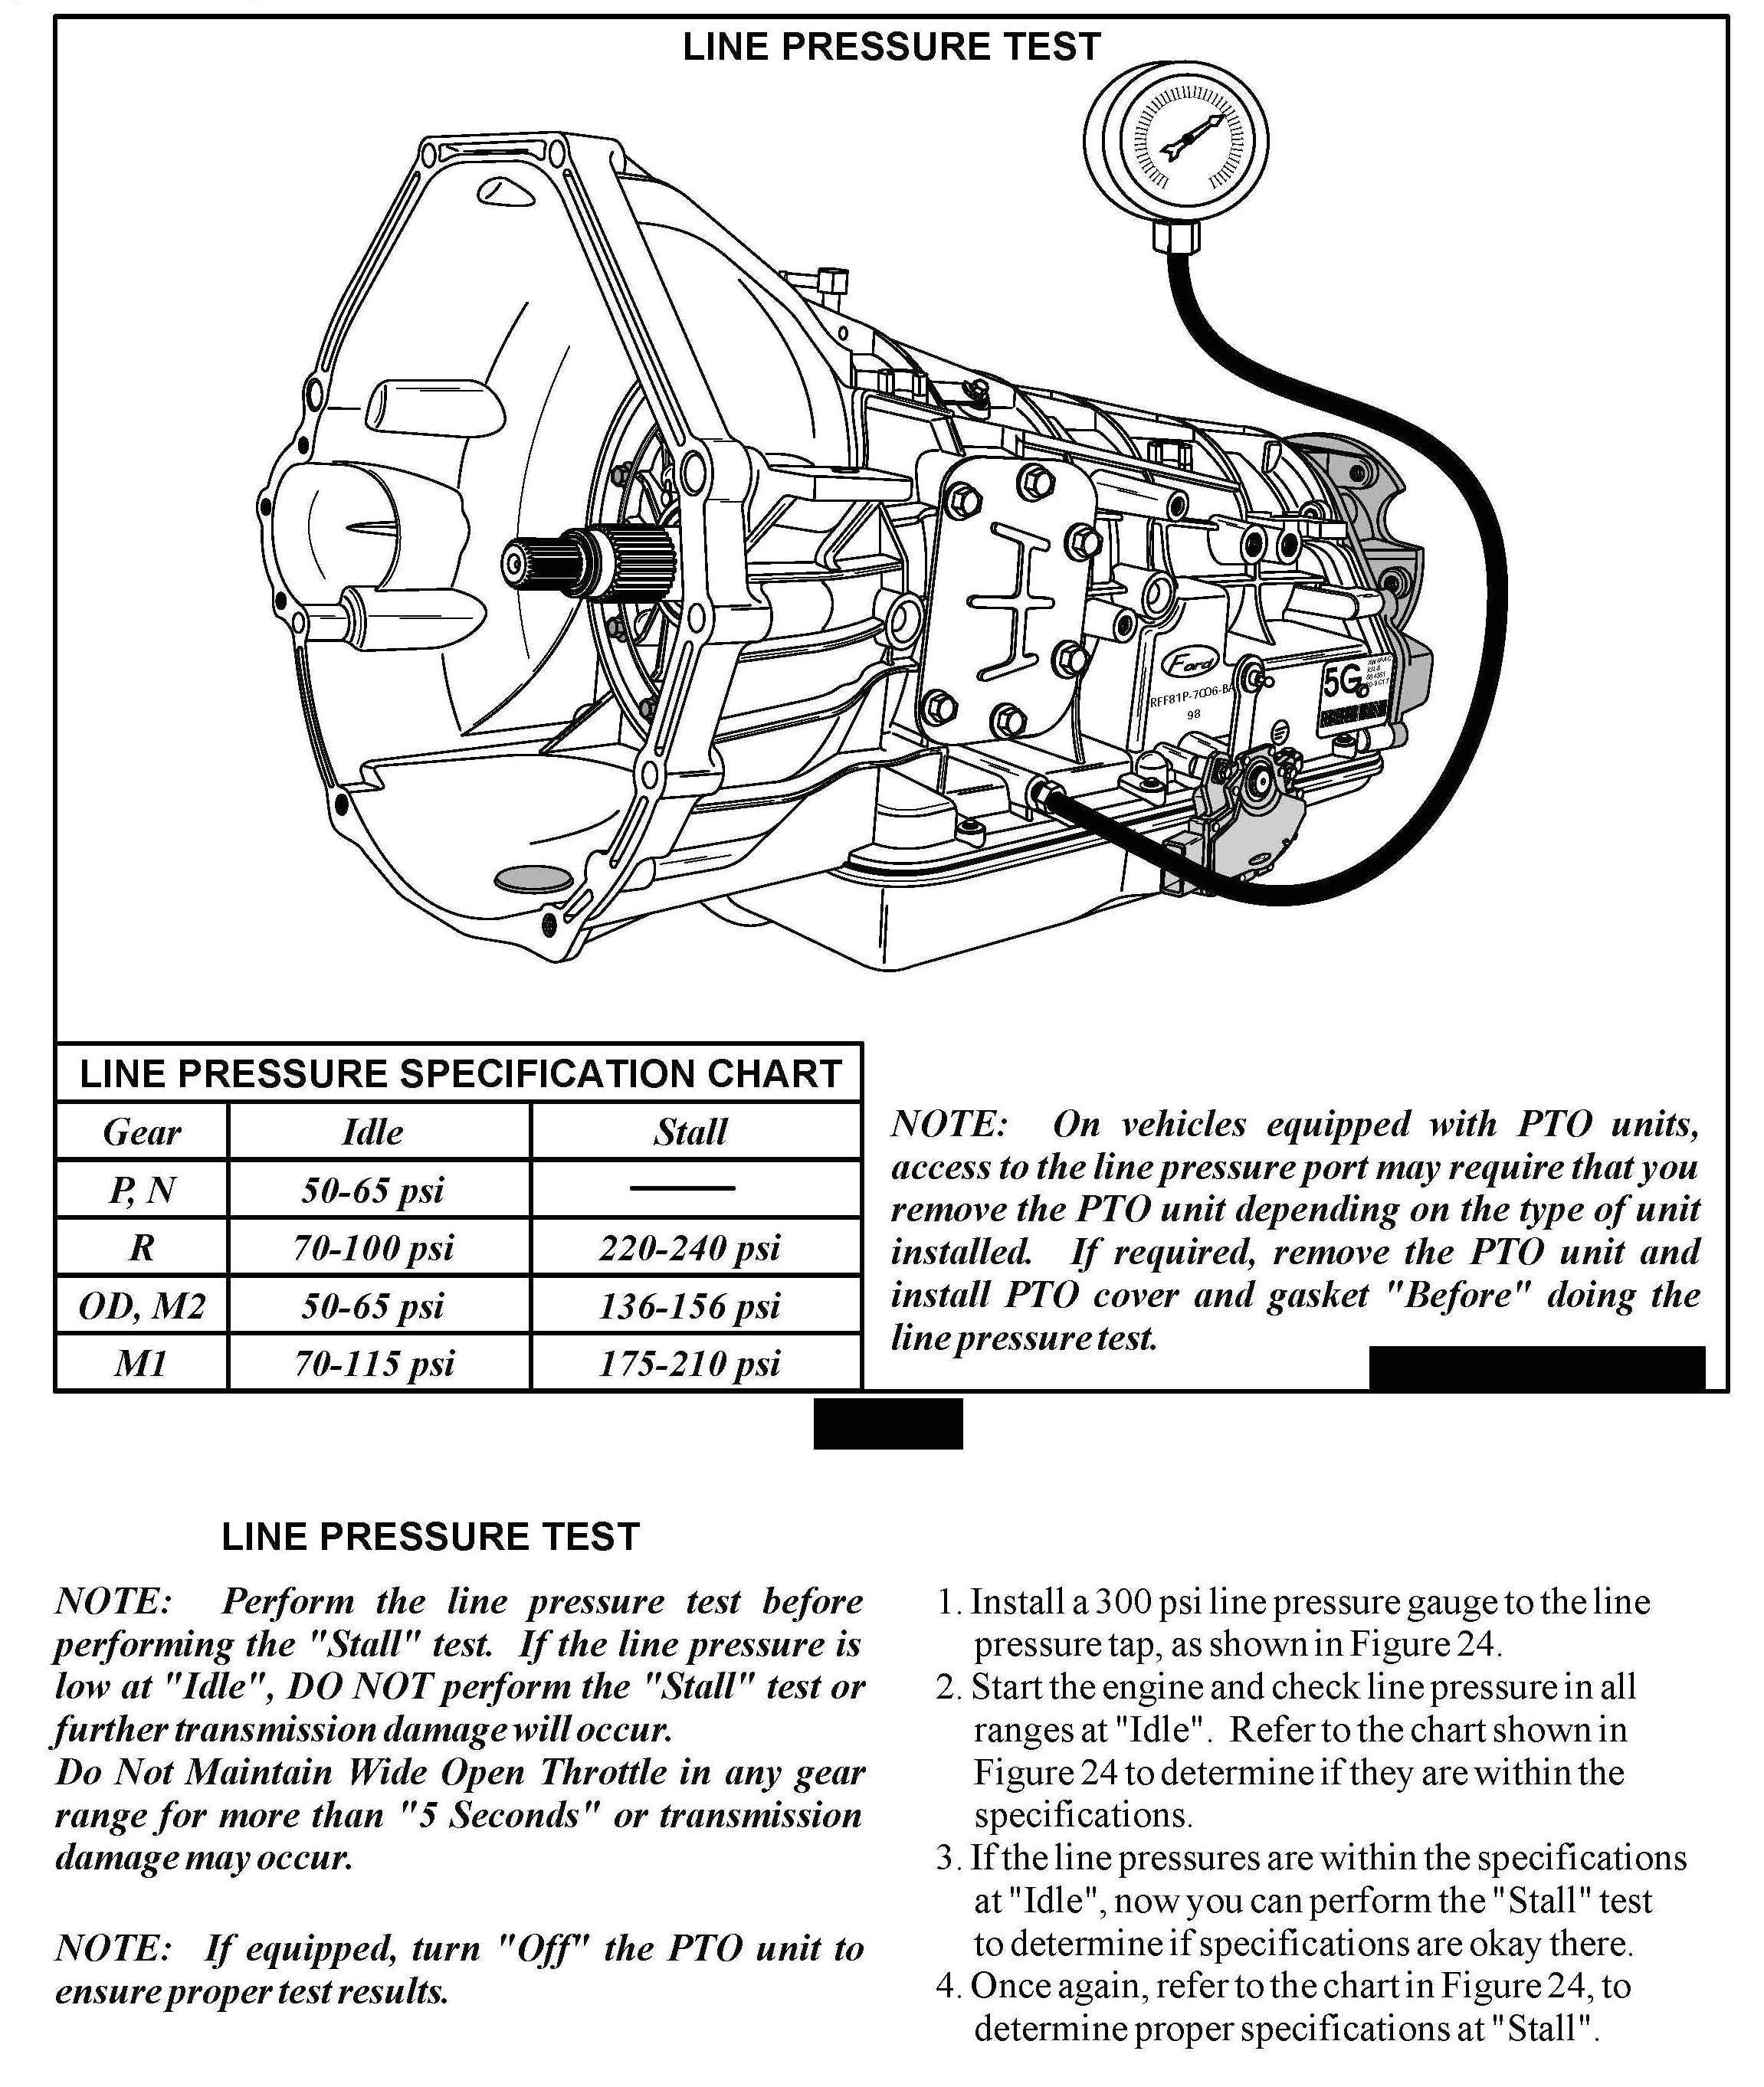 02 dodge ram alternator wiring wiring diagram official 02 dodge ram alternator wiring diagram